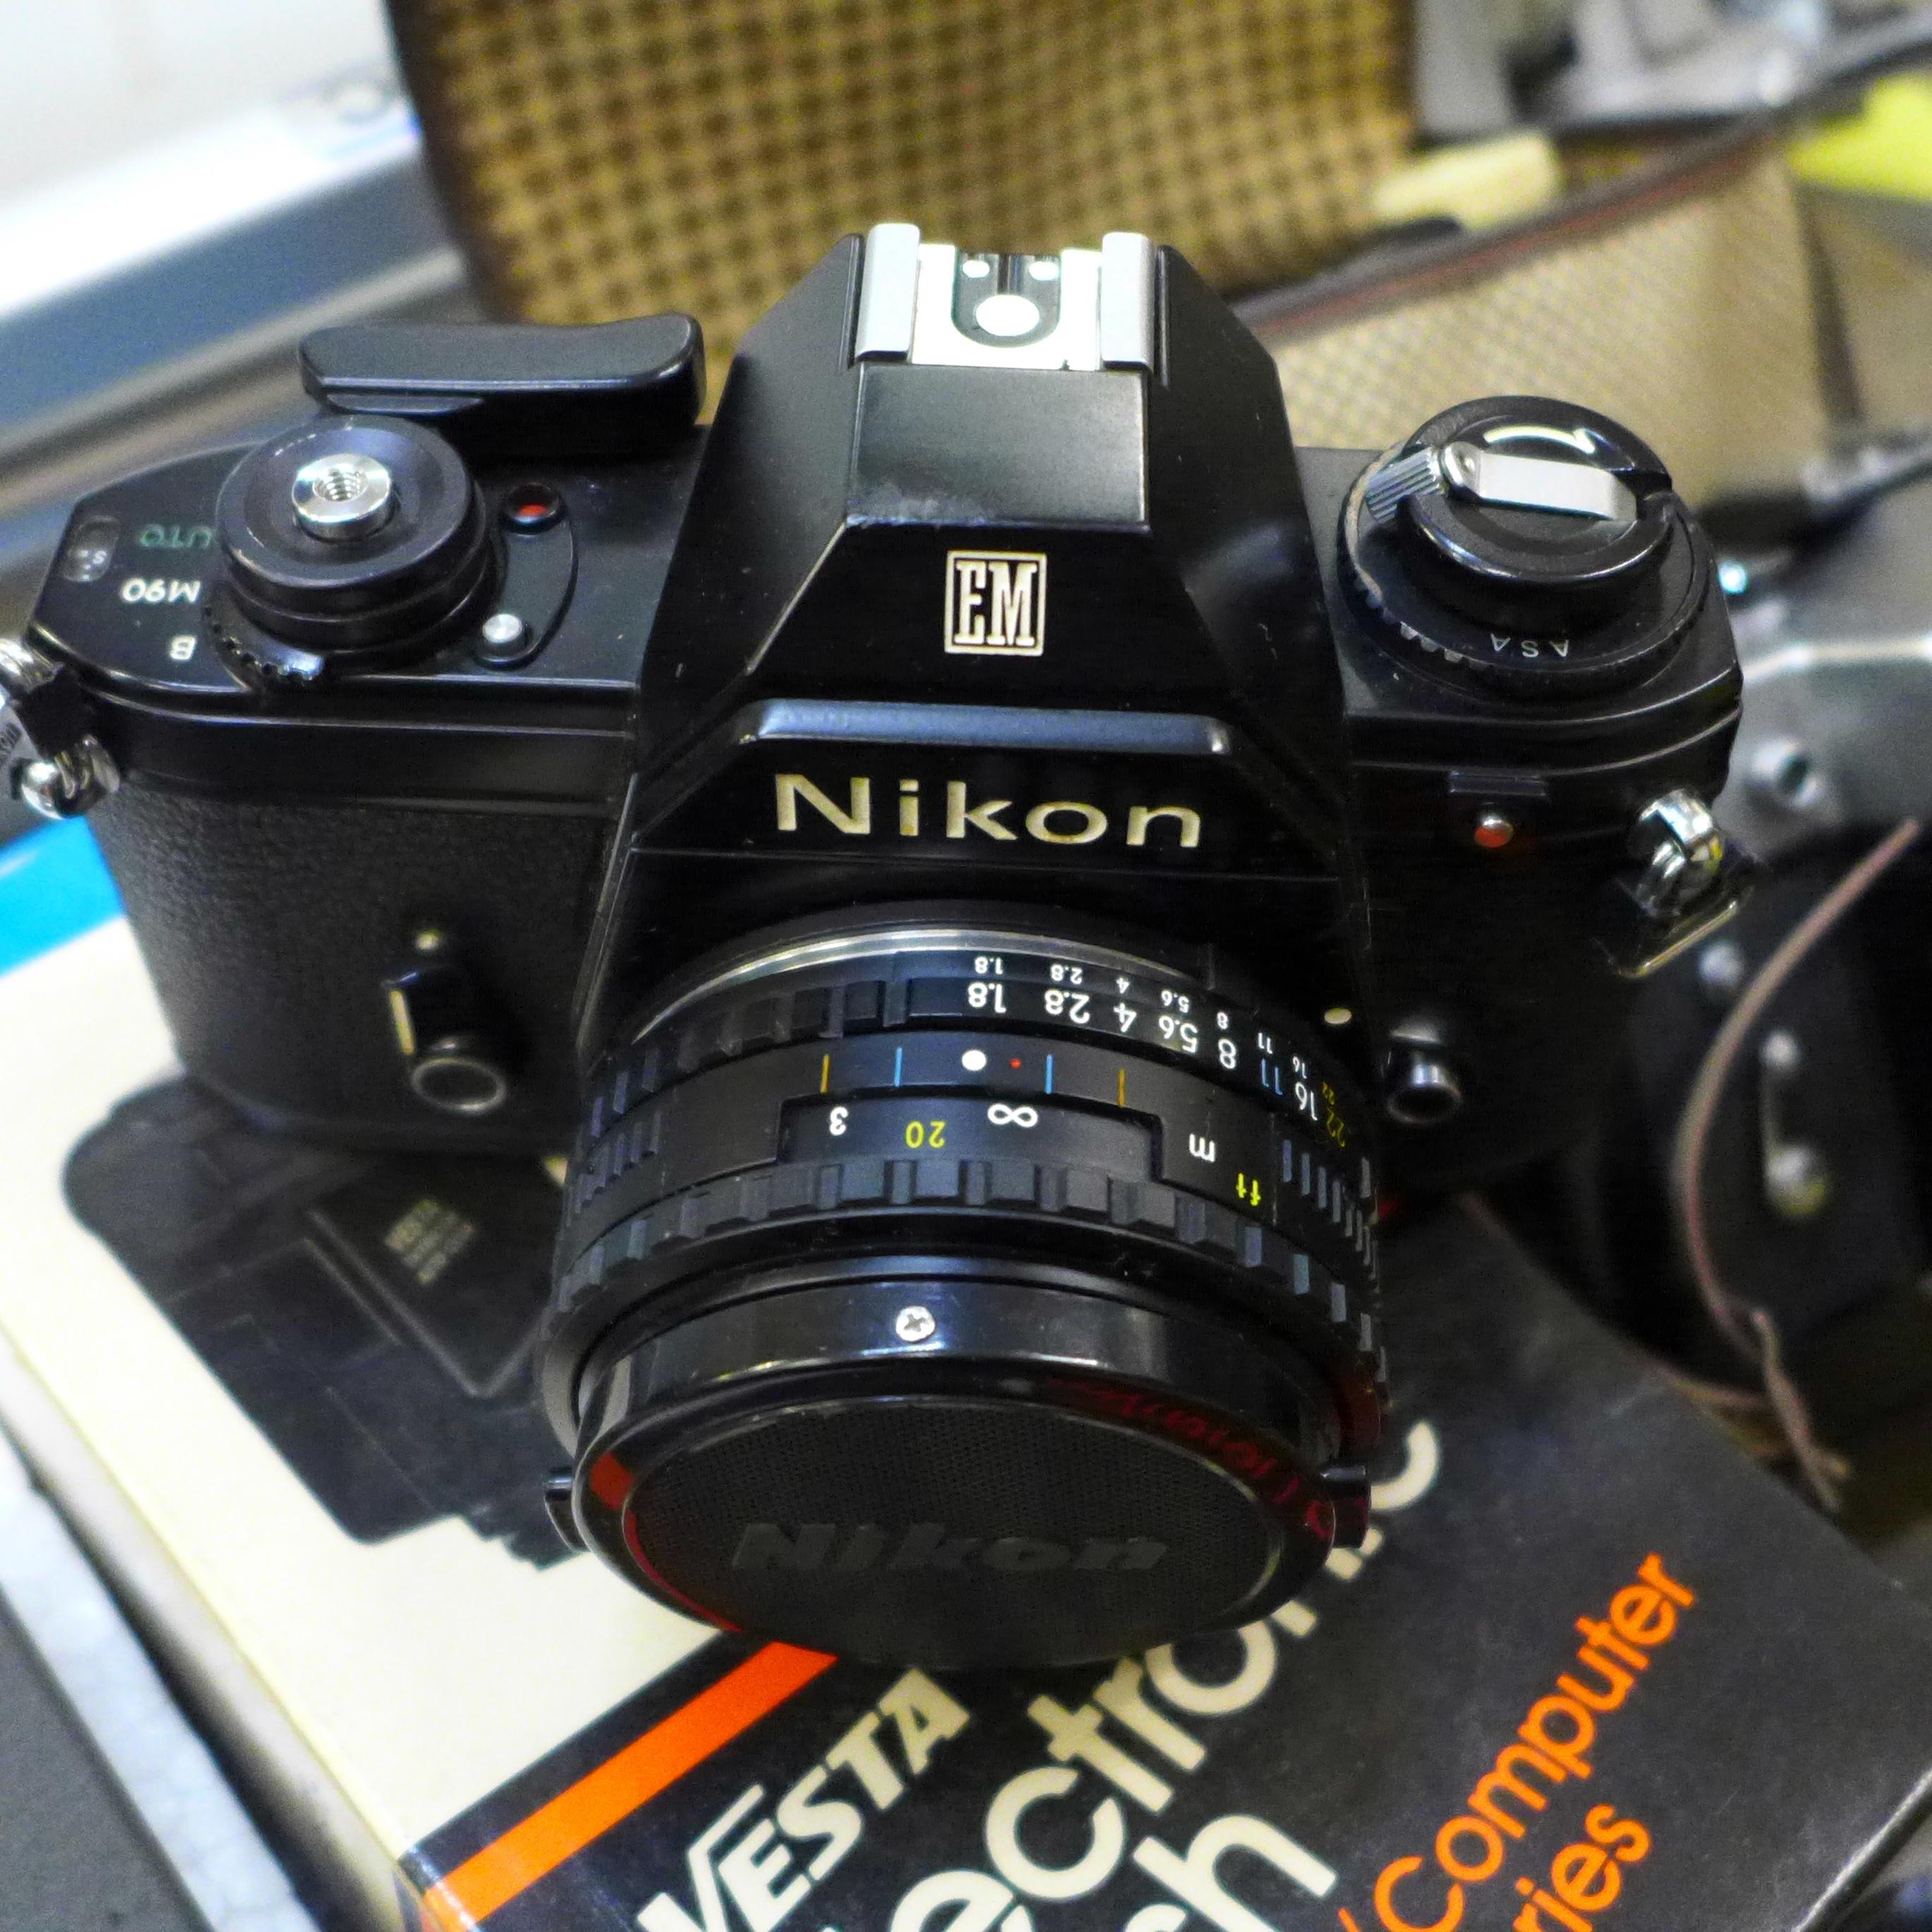 Five cameras; Yashica Mat-124 G, Nikon EM, Del Monza, Kodak Brownie, Zenit-E, a Jello cine camera, - Image 6 of 6